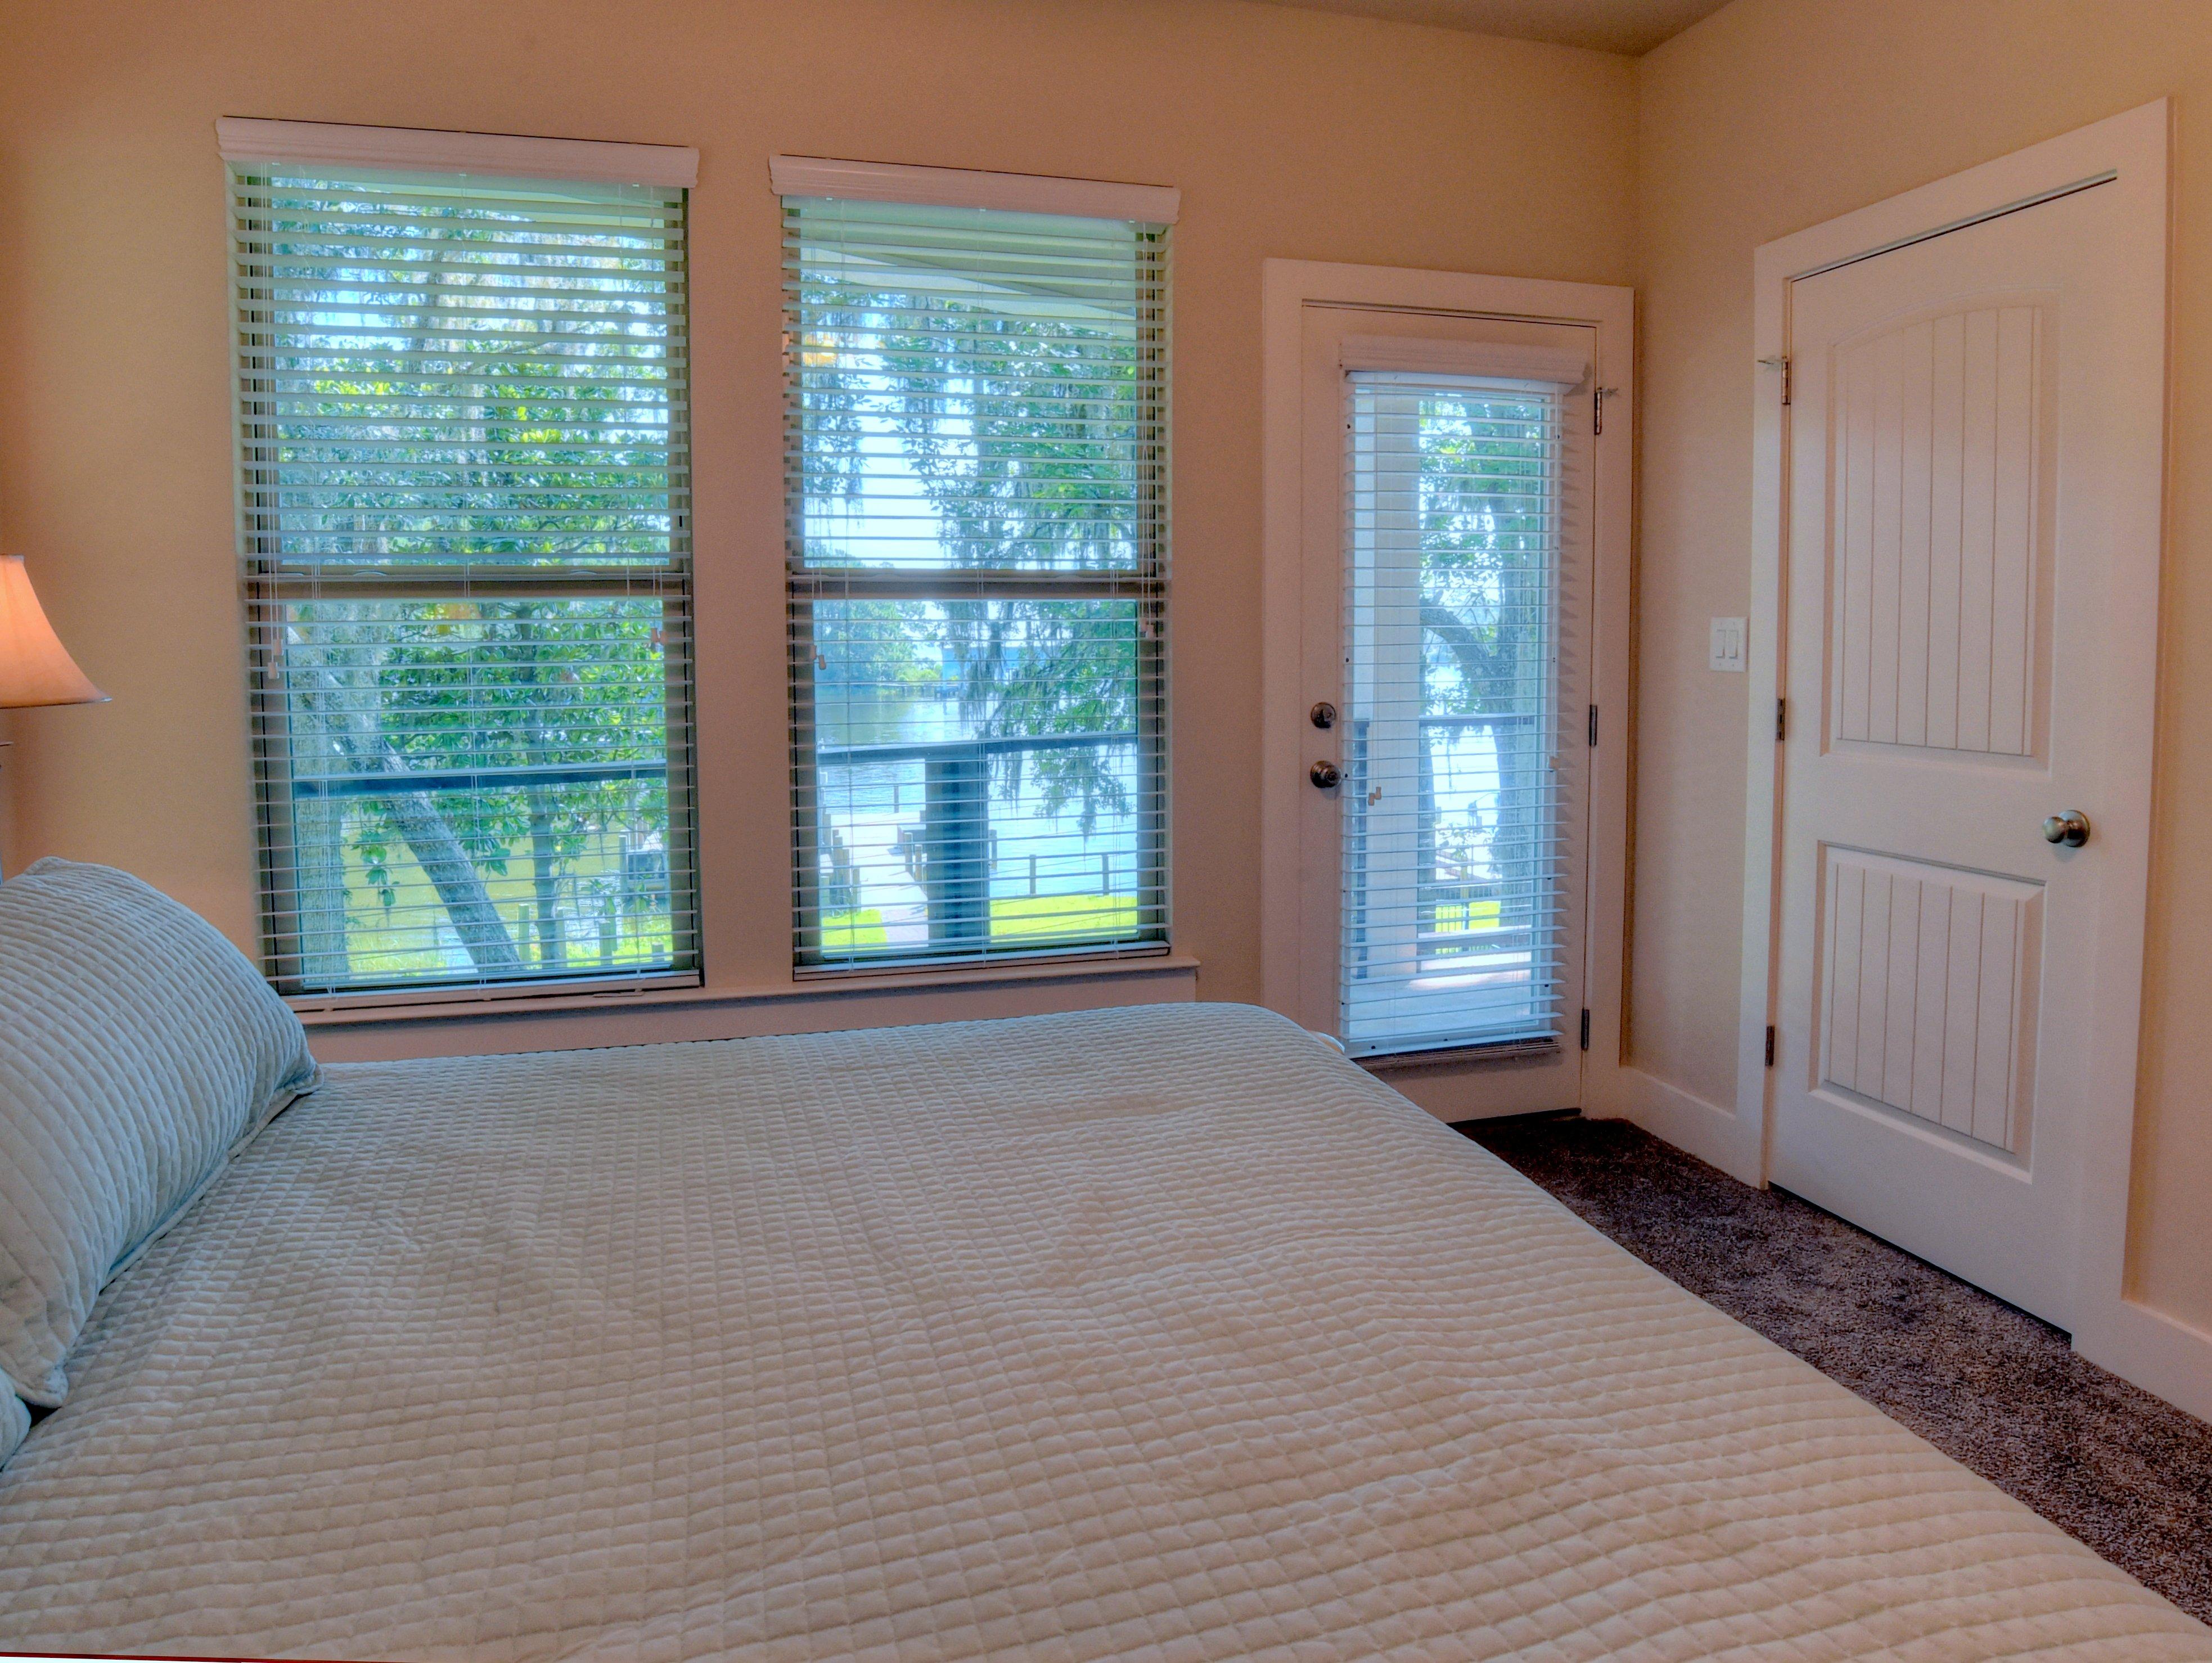 93 Beacon Point Condo rental in Sandestin Rentals ~ Cottages and Villas  in Destin Florida - #24